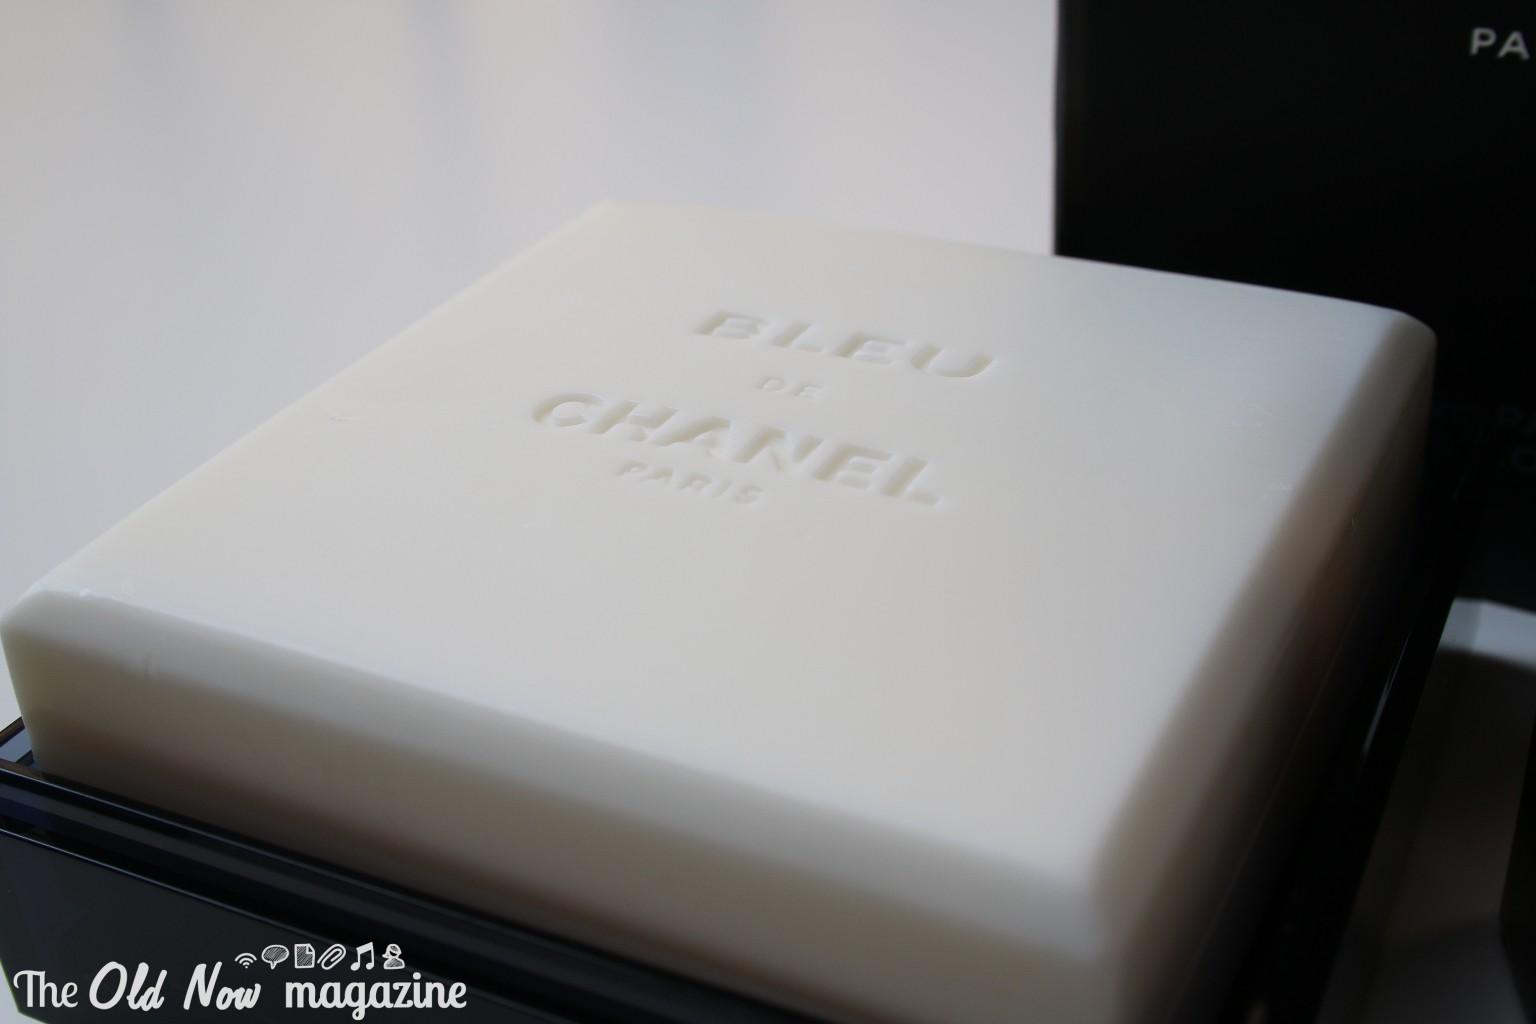 Bleu de Chanel CHANEL THEOLDNOW (5)